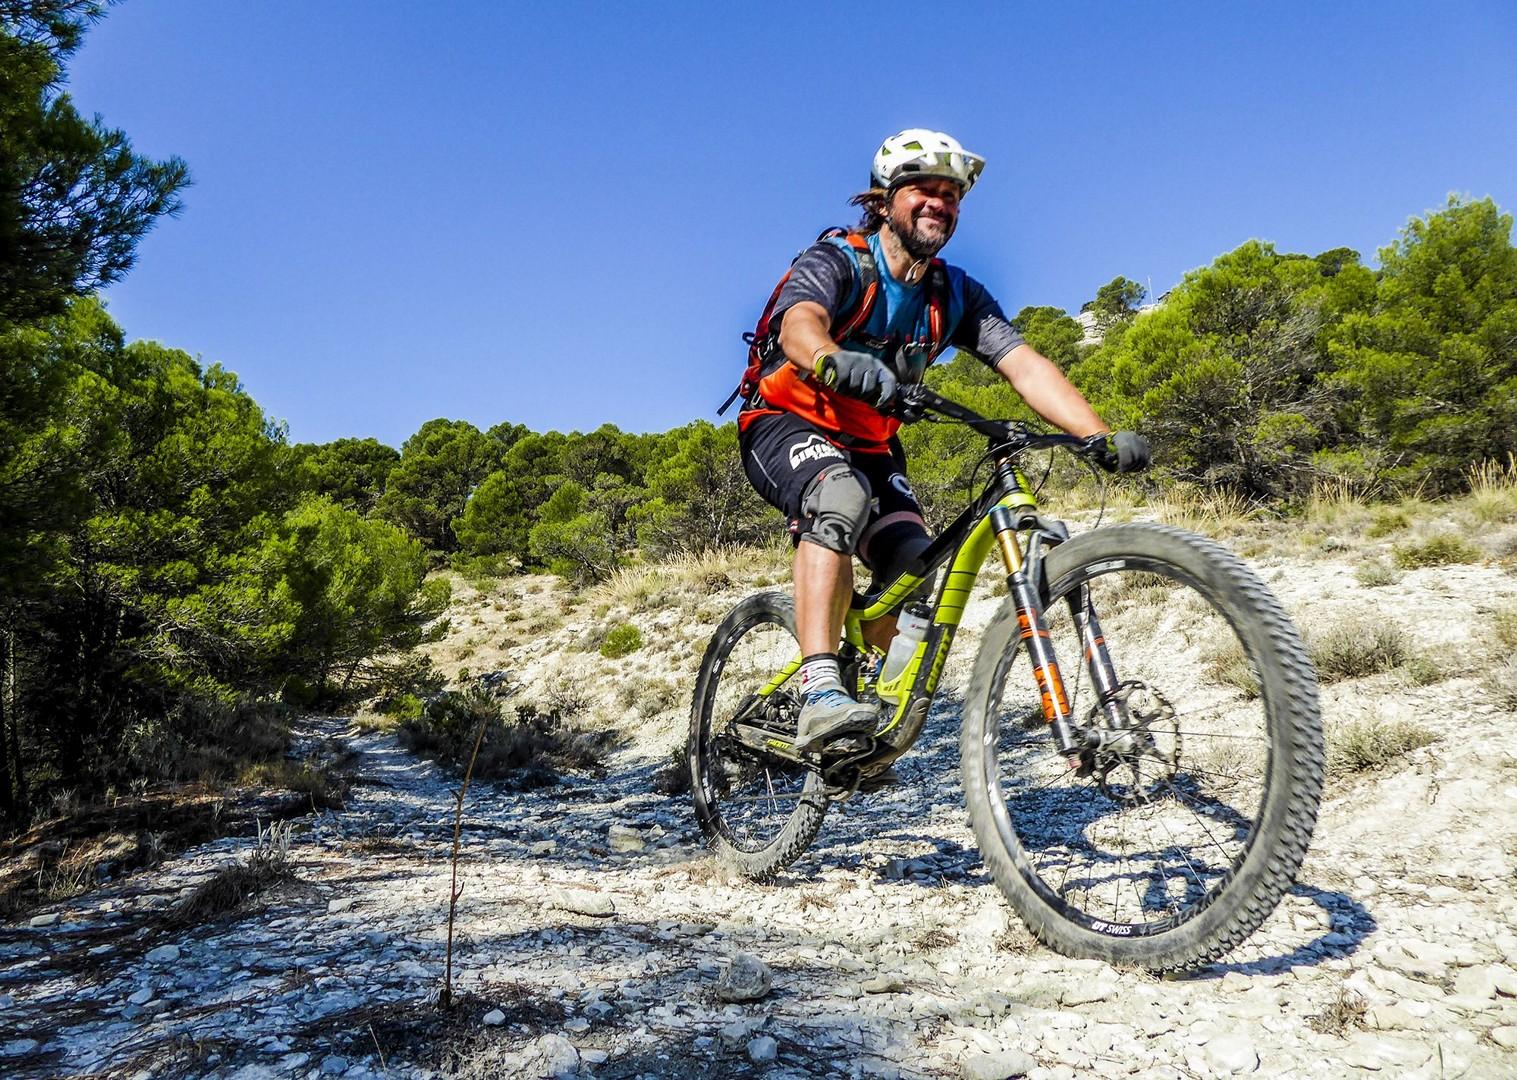 awesome-andalucia-spain-mountain-biking-skedaddle.jpg - Spain - Awesome Andalucia - Guided Mountain Bike Holiday - Mountain Biking